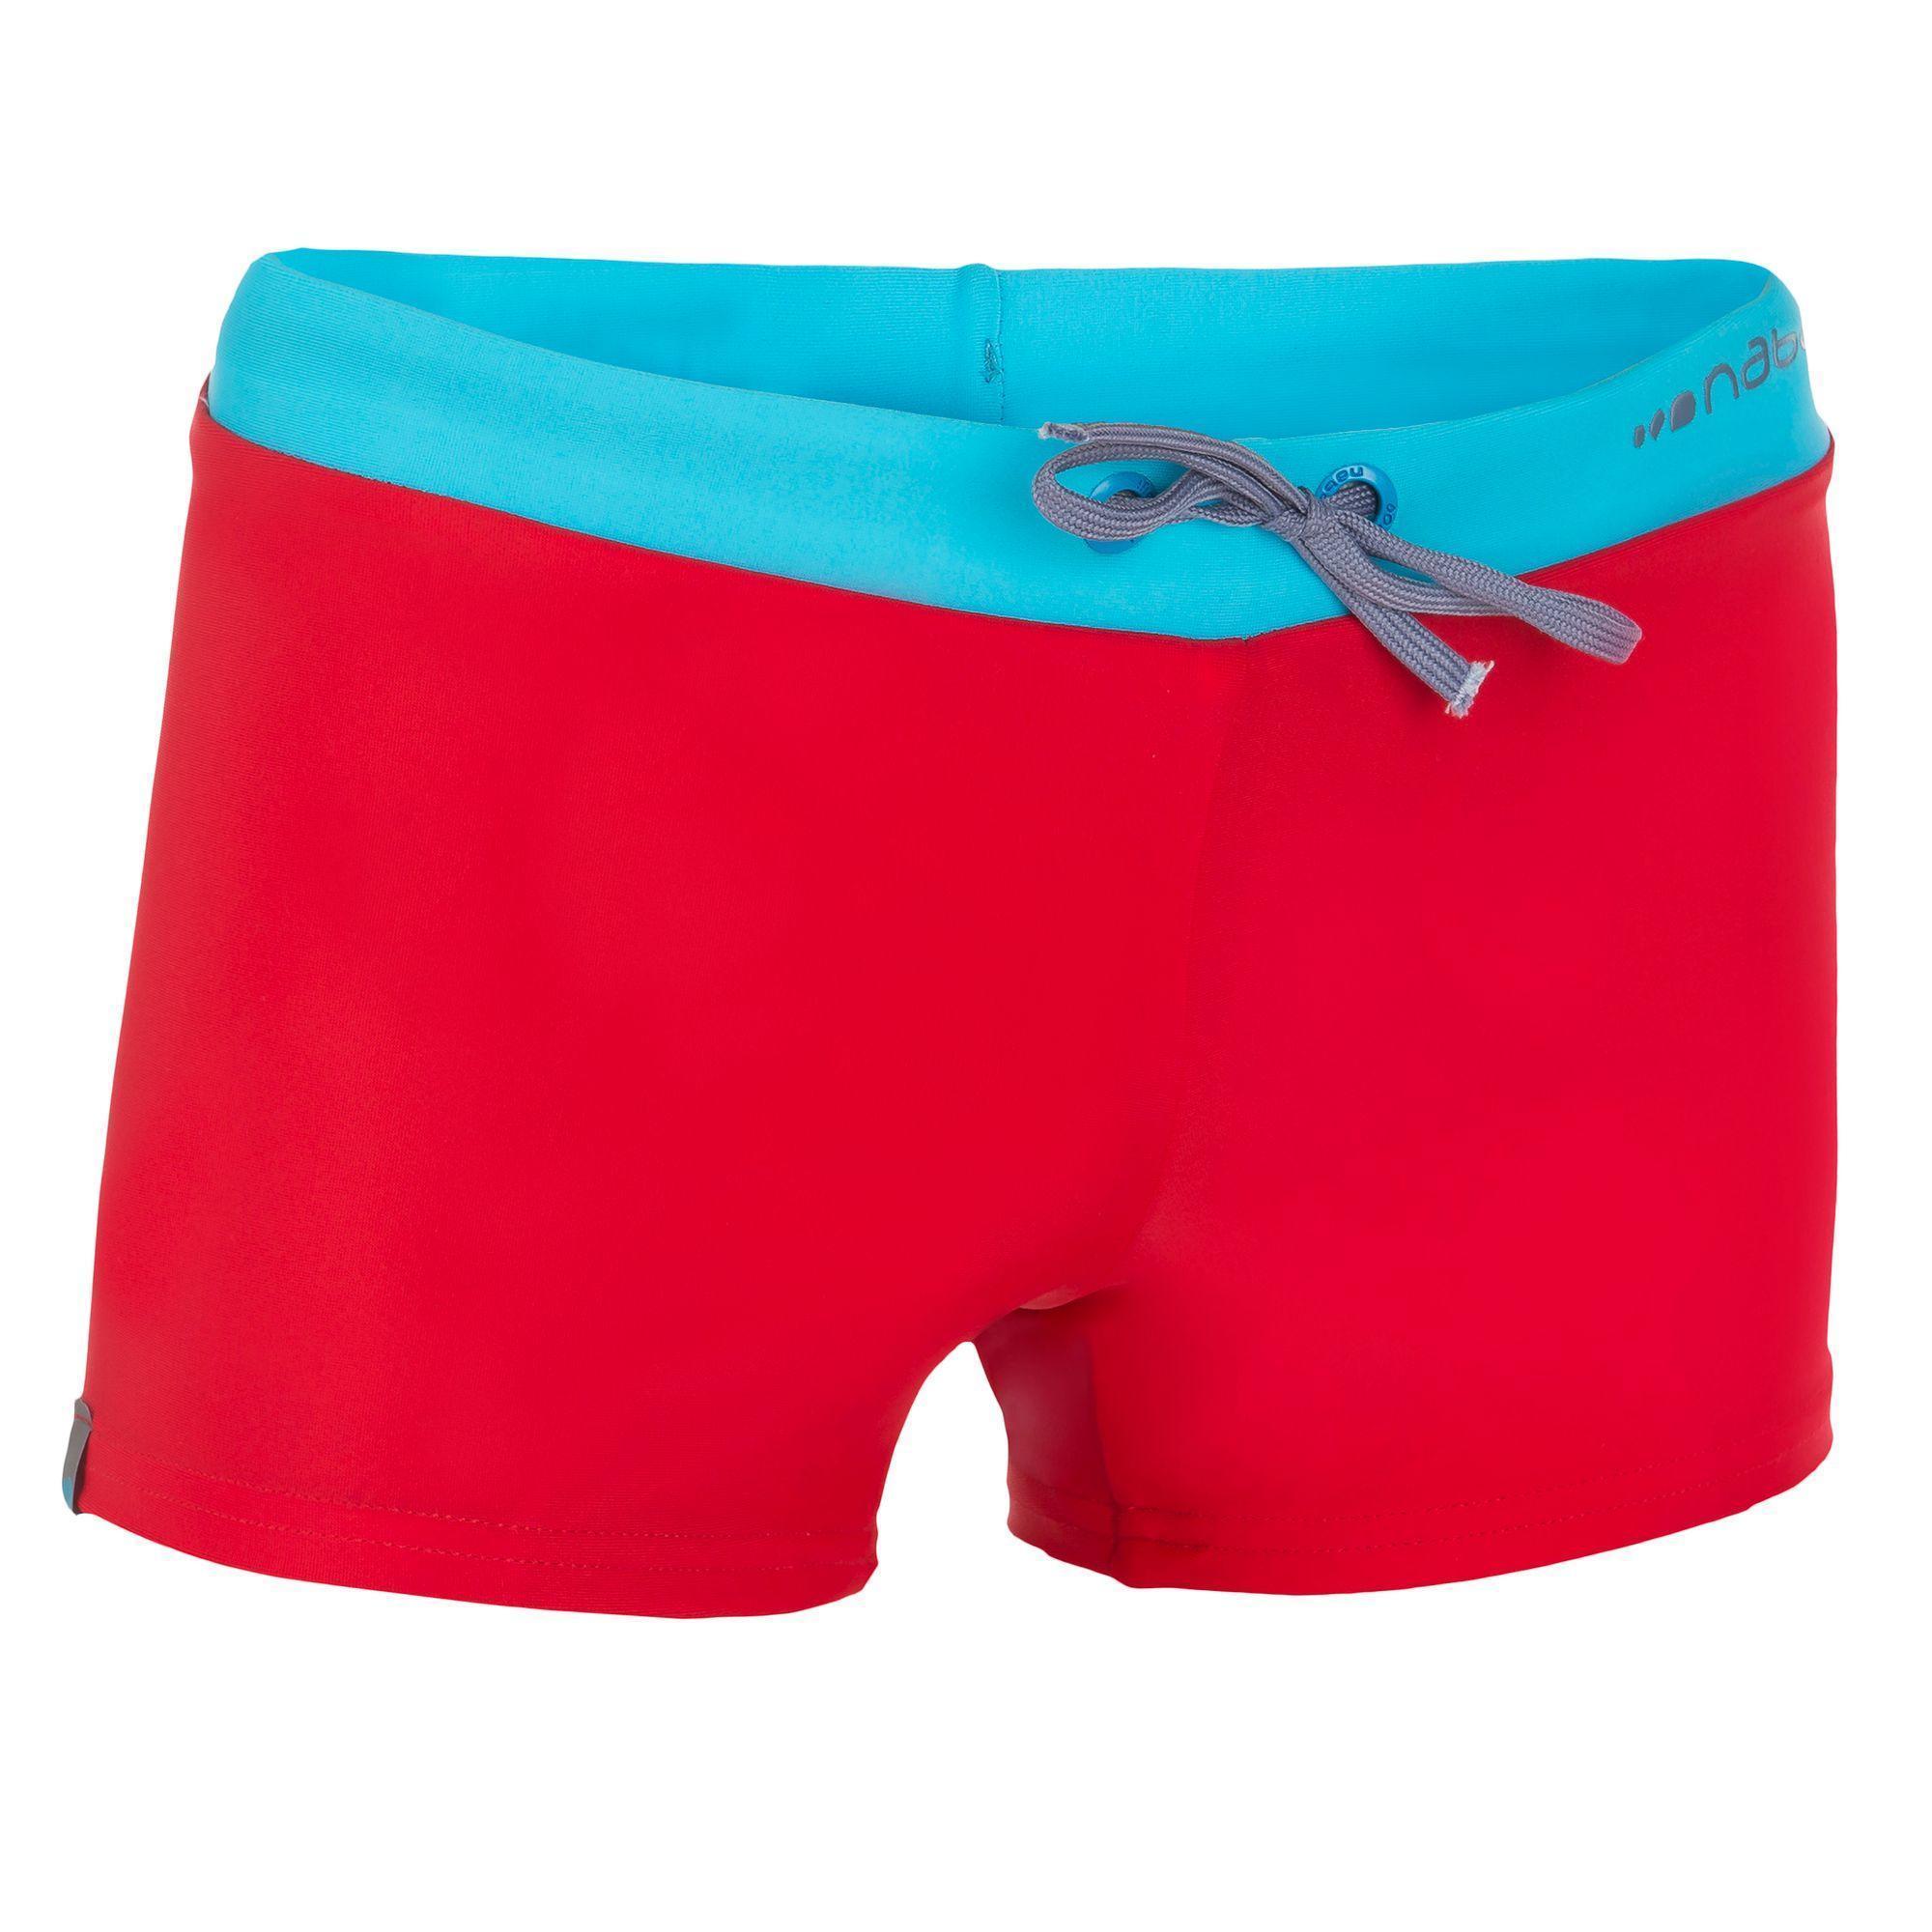 maillot de bain garcon boxer b active pep rouge bleu nabaiji. Black Bedroom Furniture Sets. Home Design Ideas